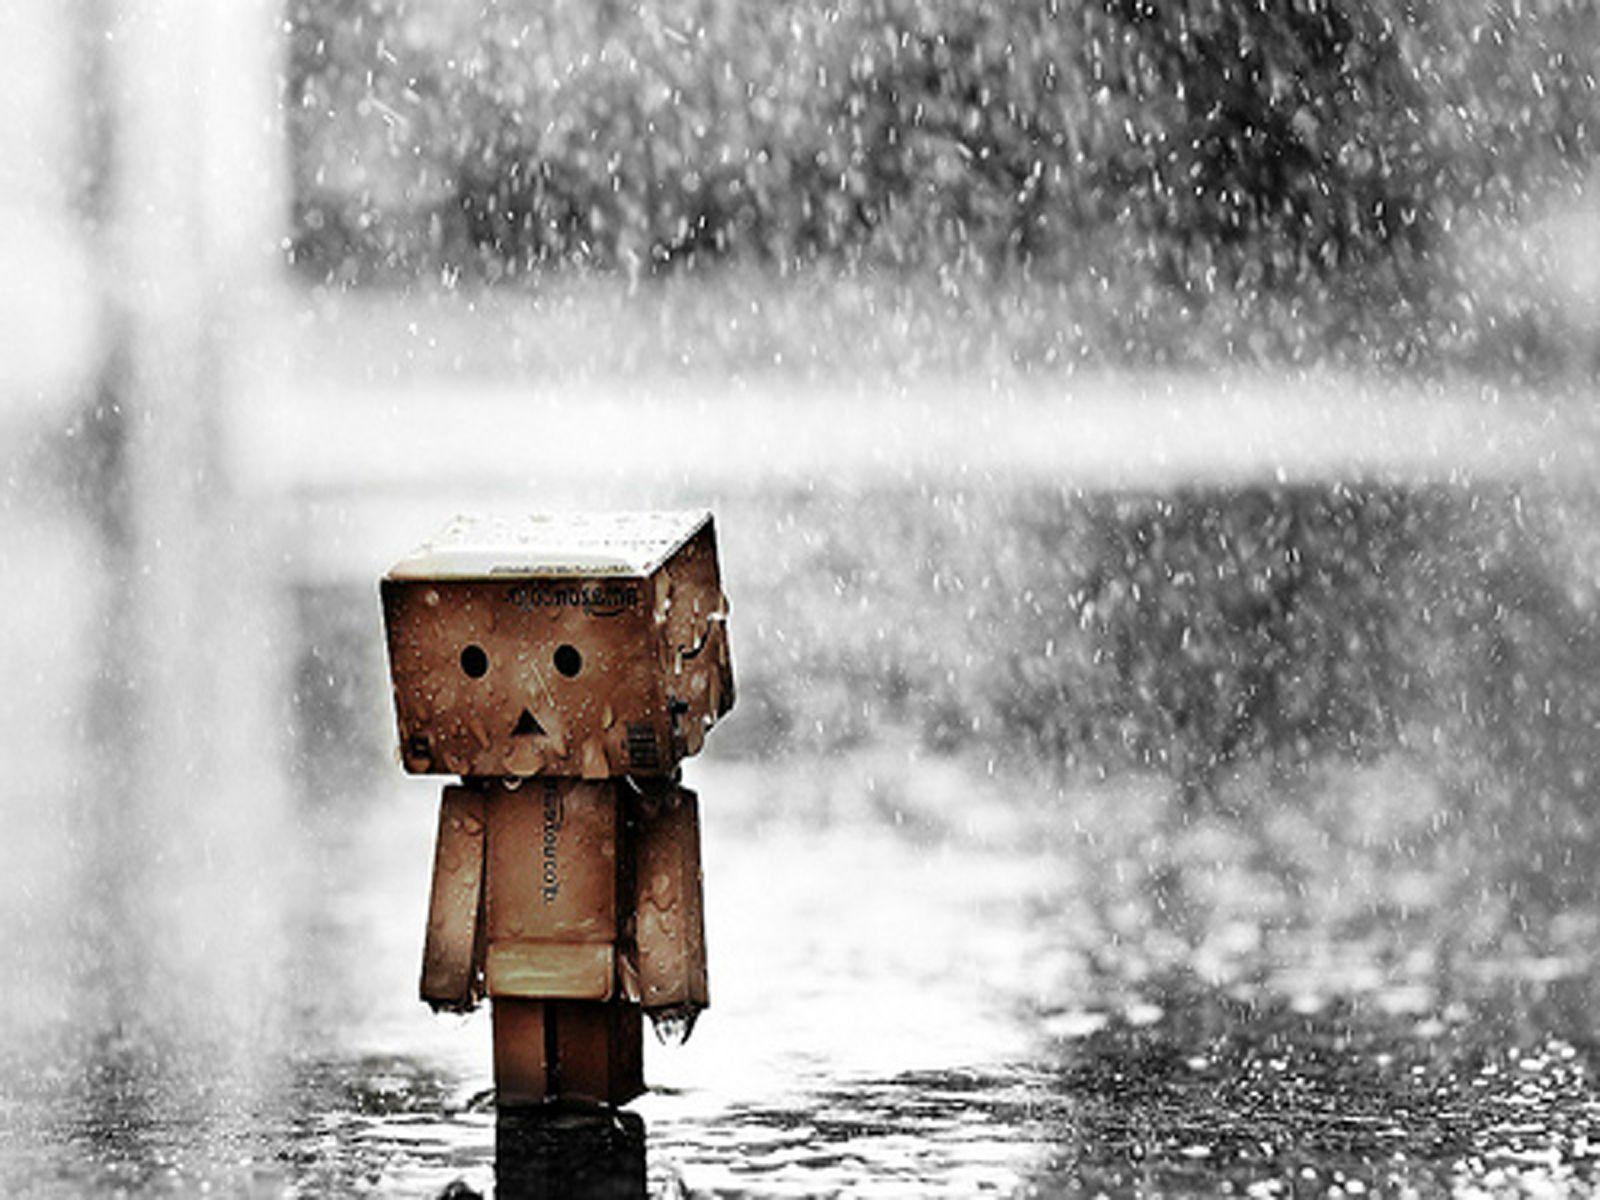 Danbo Rain Wallpaper Picture Wallpaper Pictures Rain Wallpapers Cool Backgrounds